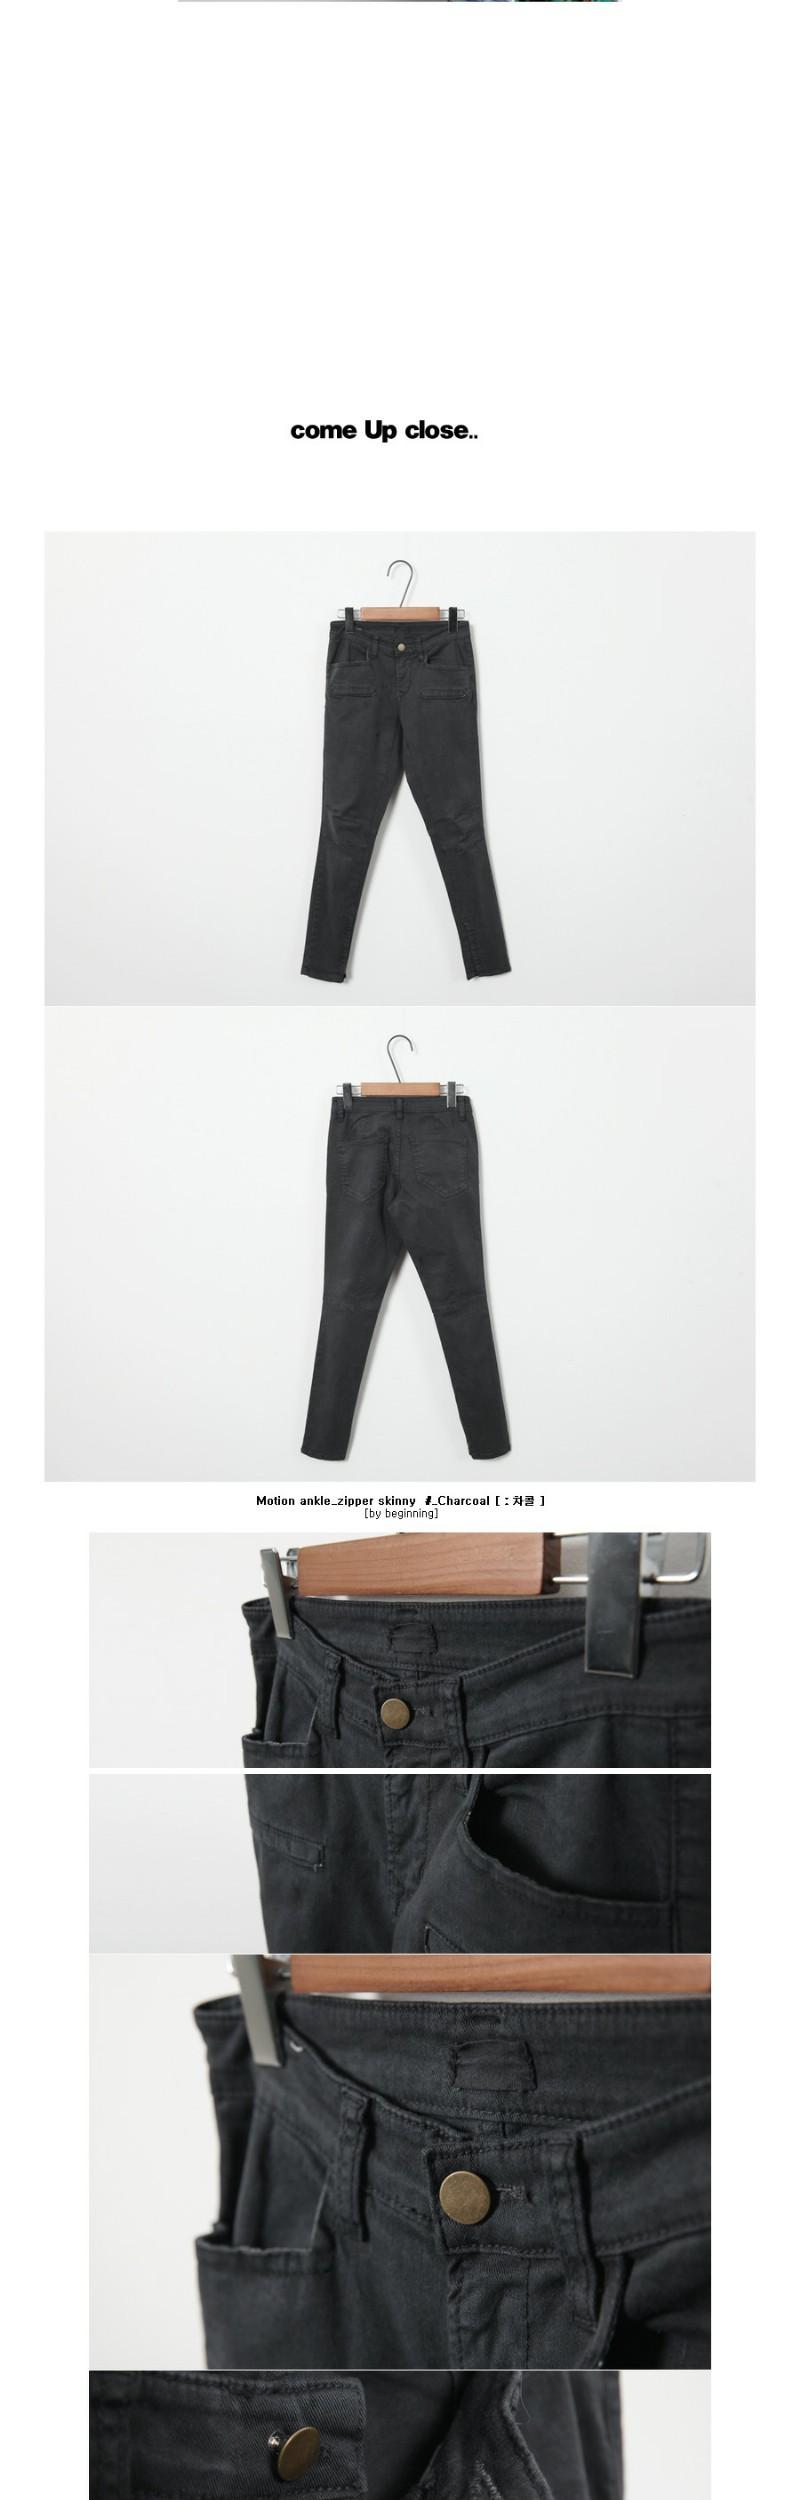 Motion ankle_zipper skinny